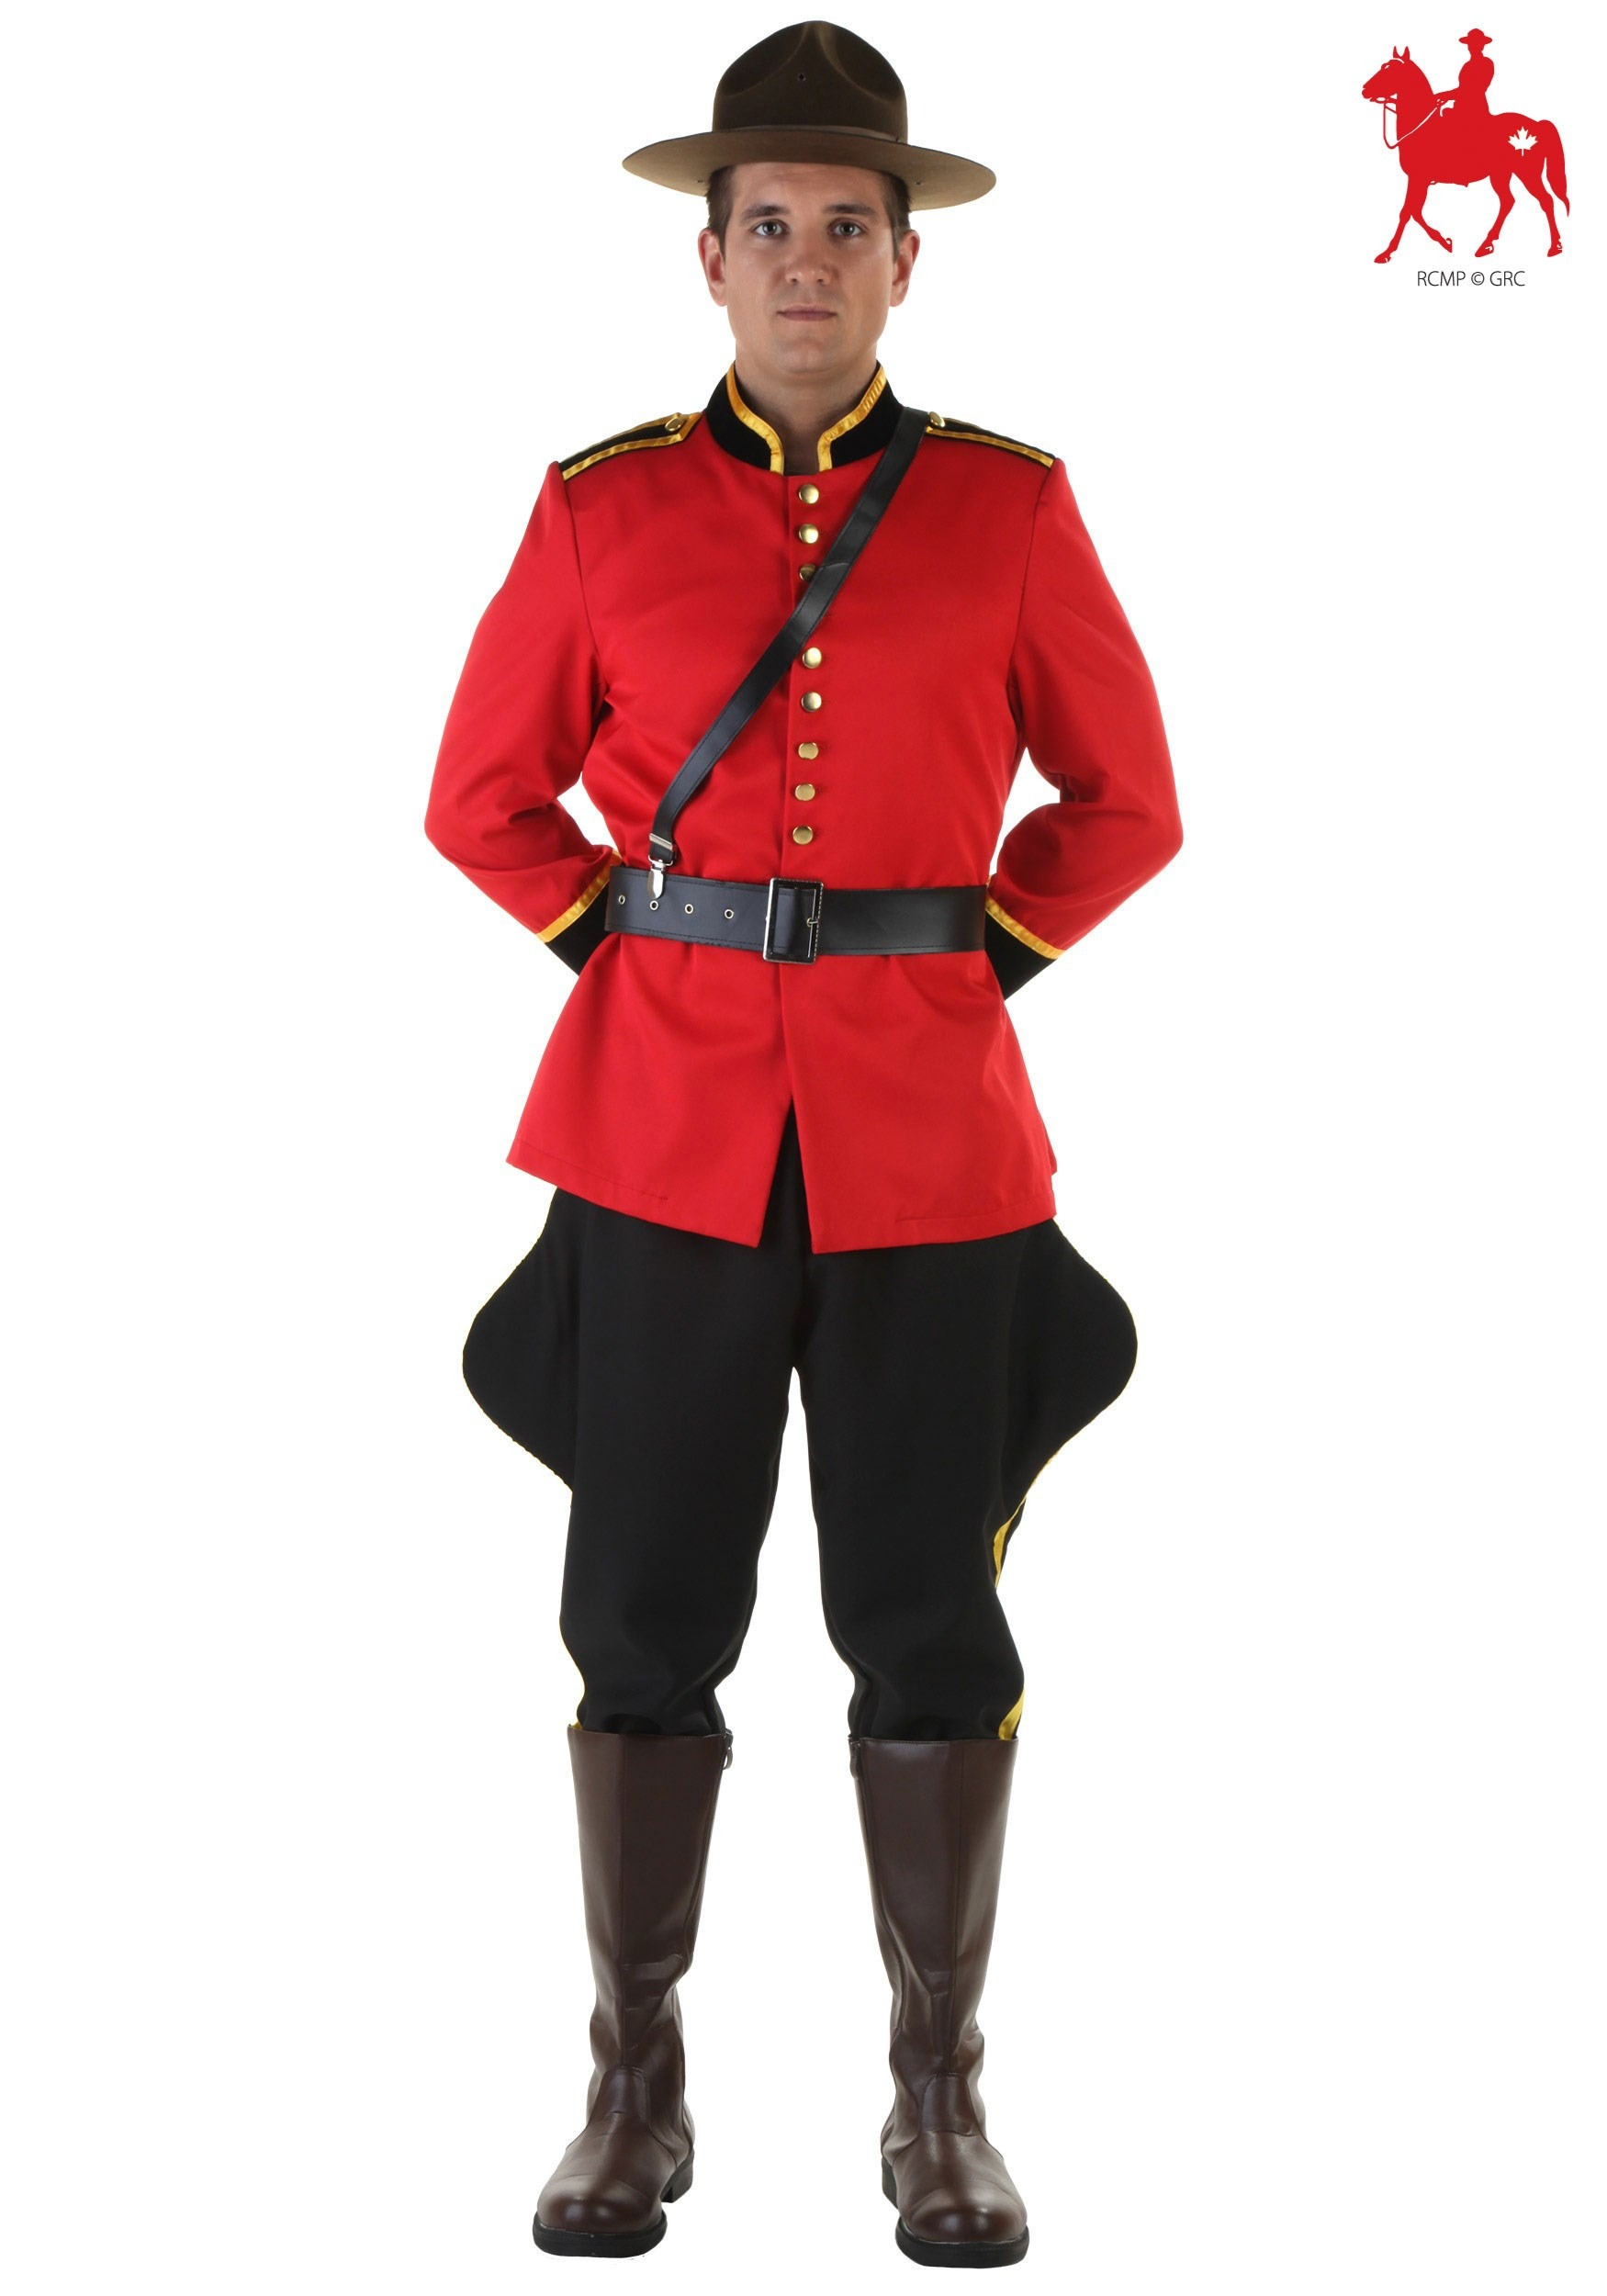 Men's Canadian Mountie RCMP Costume